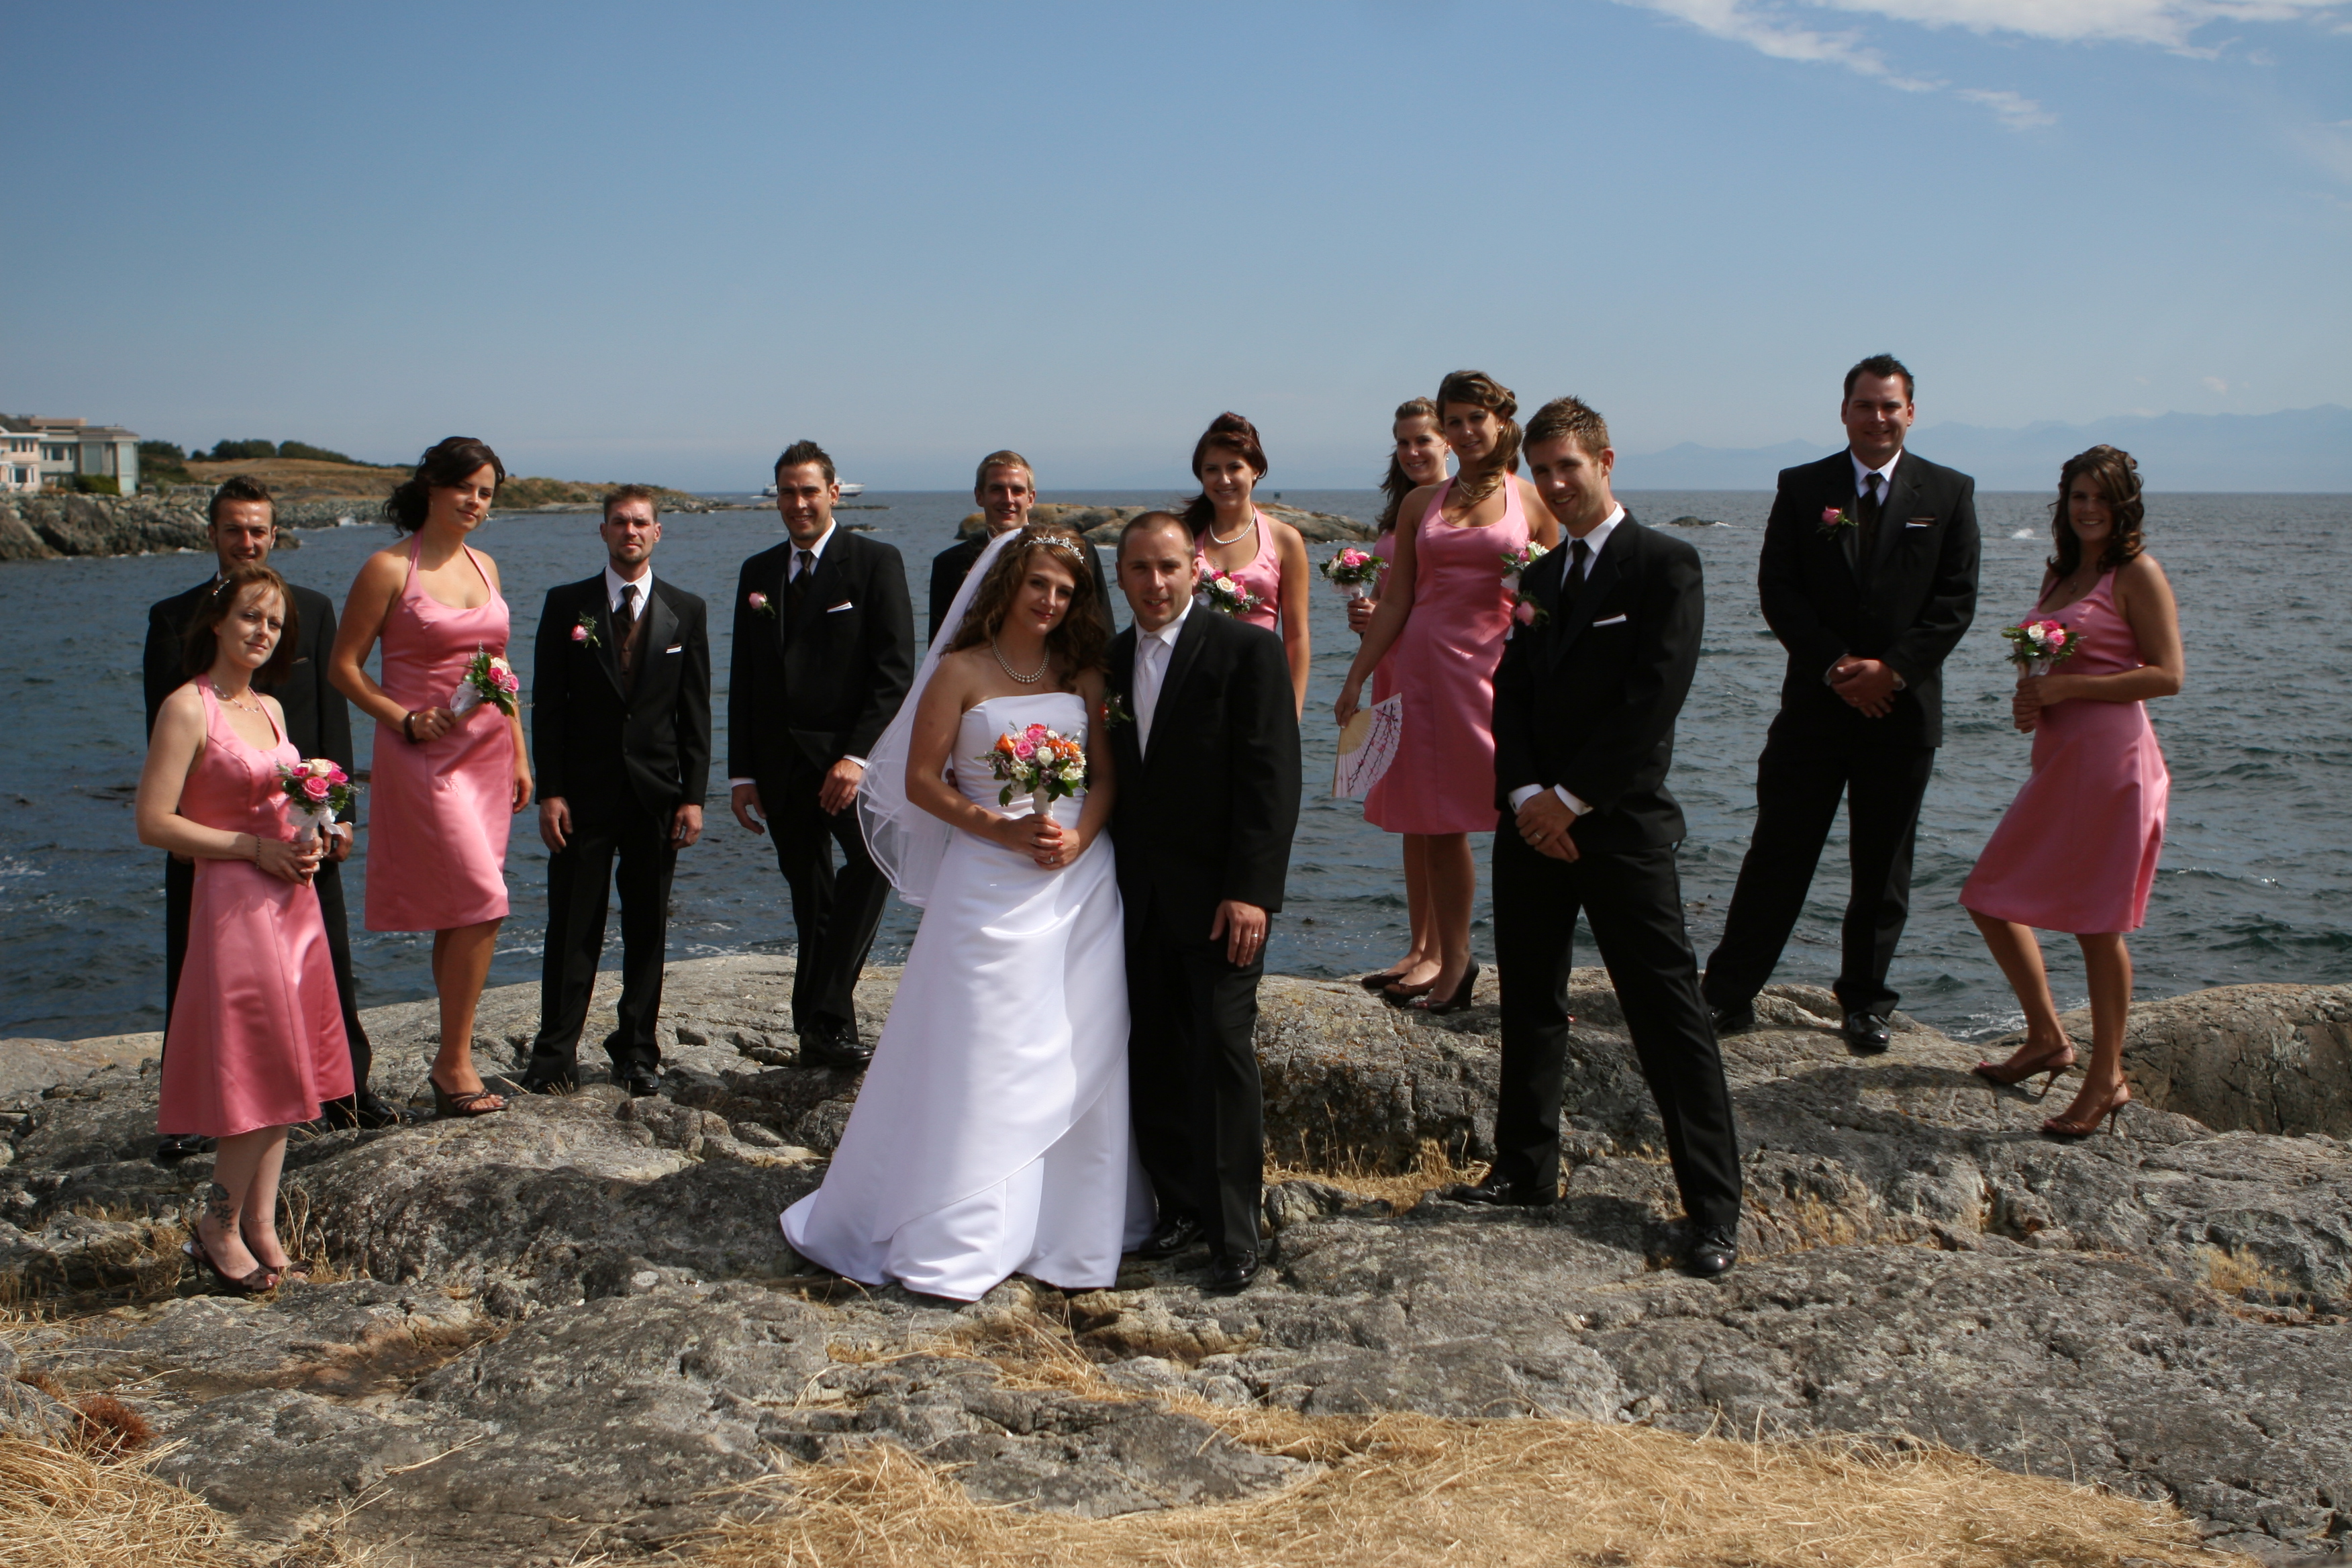 Wedding Photography | Caroline Mitic | Graphic Design